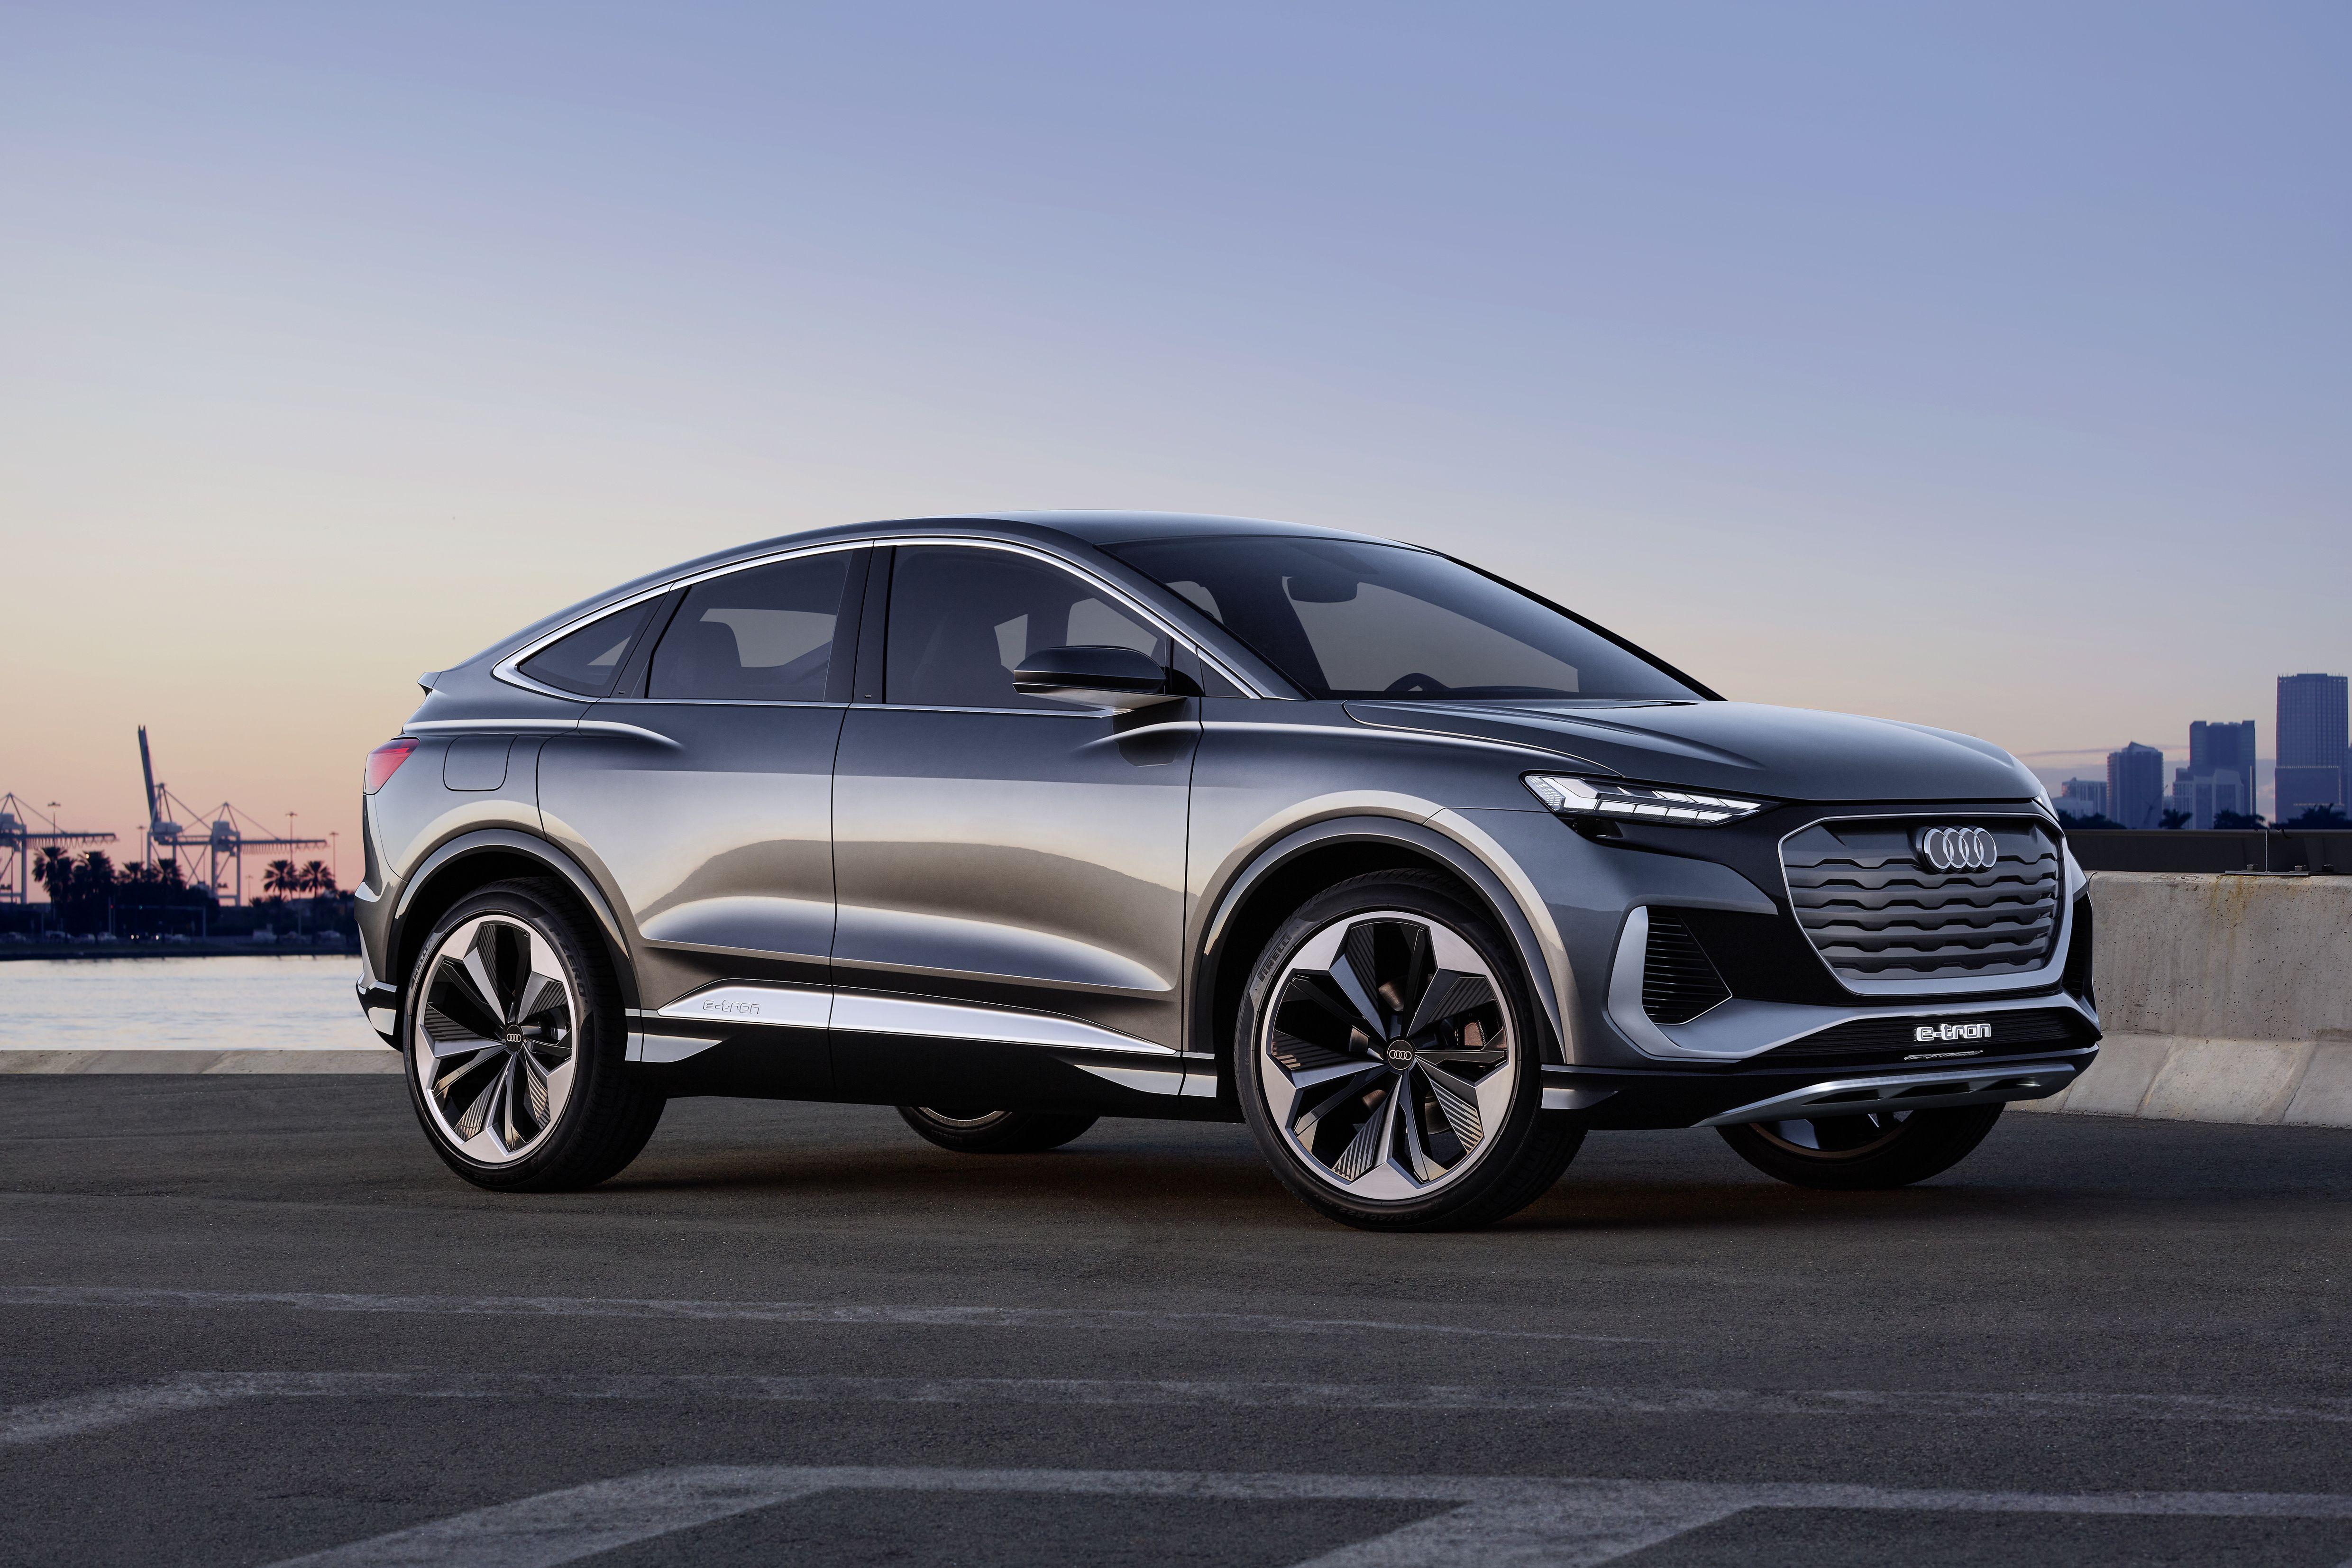 2020 Audi Q4 Sportback E Tron Concept Top Speed In 2020 Audi Q4 Audi E Tron Tron